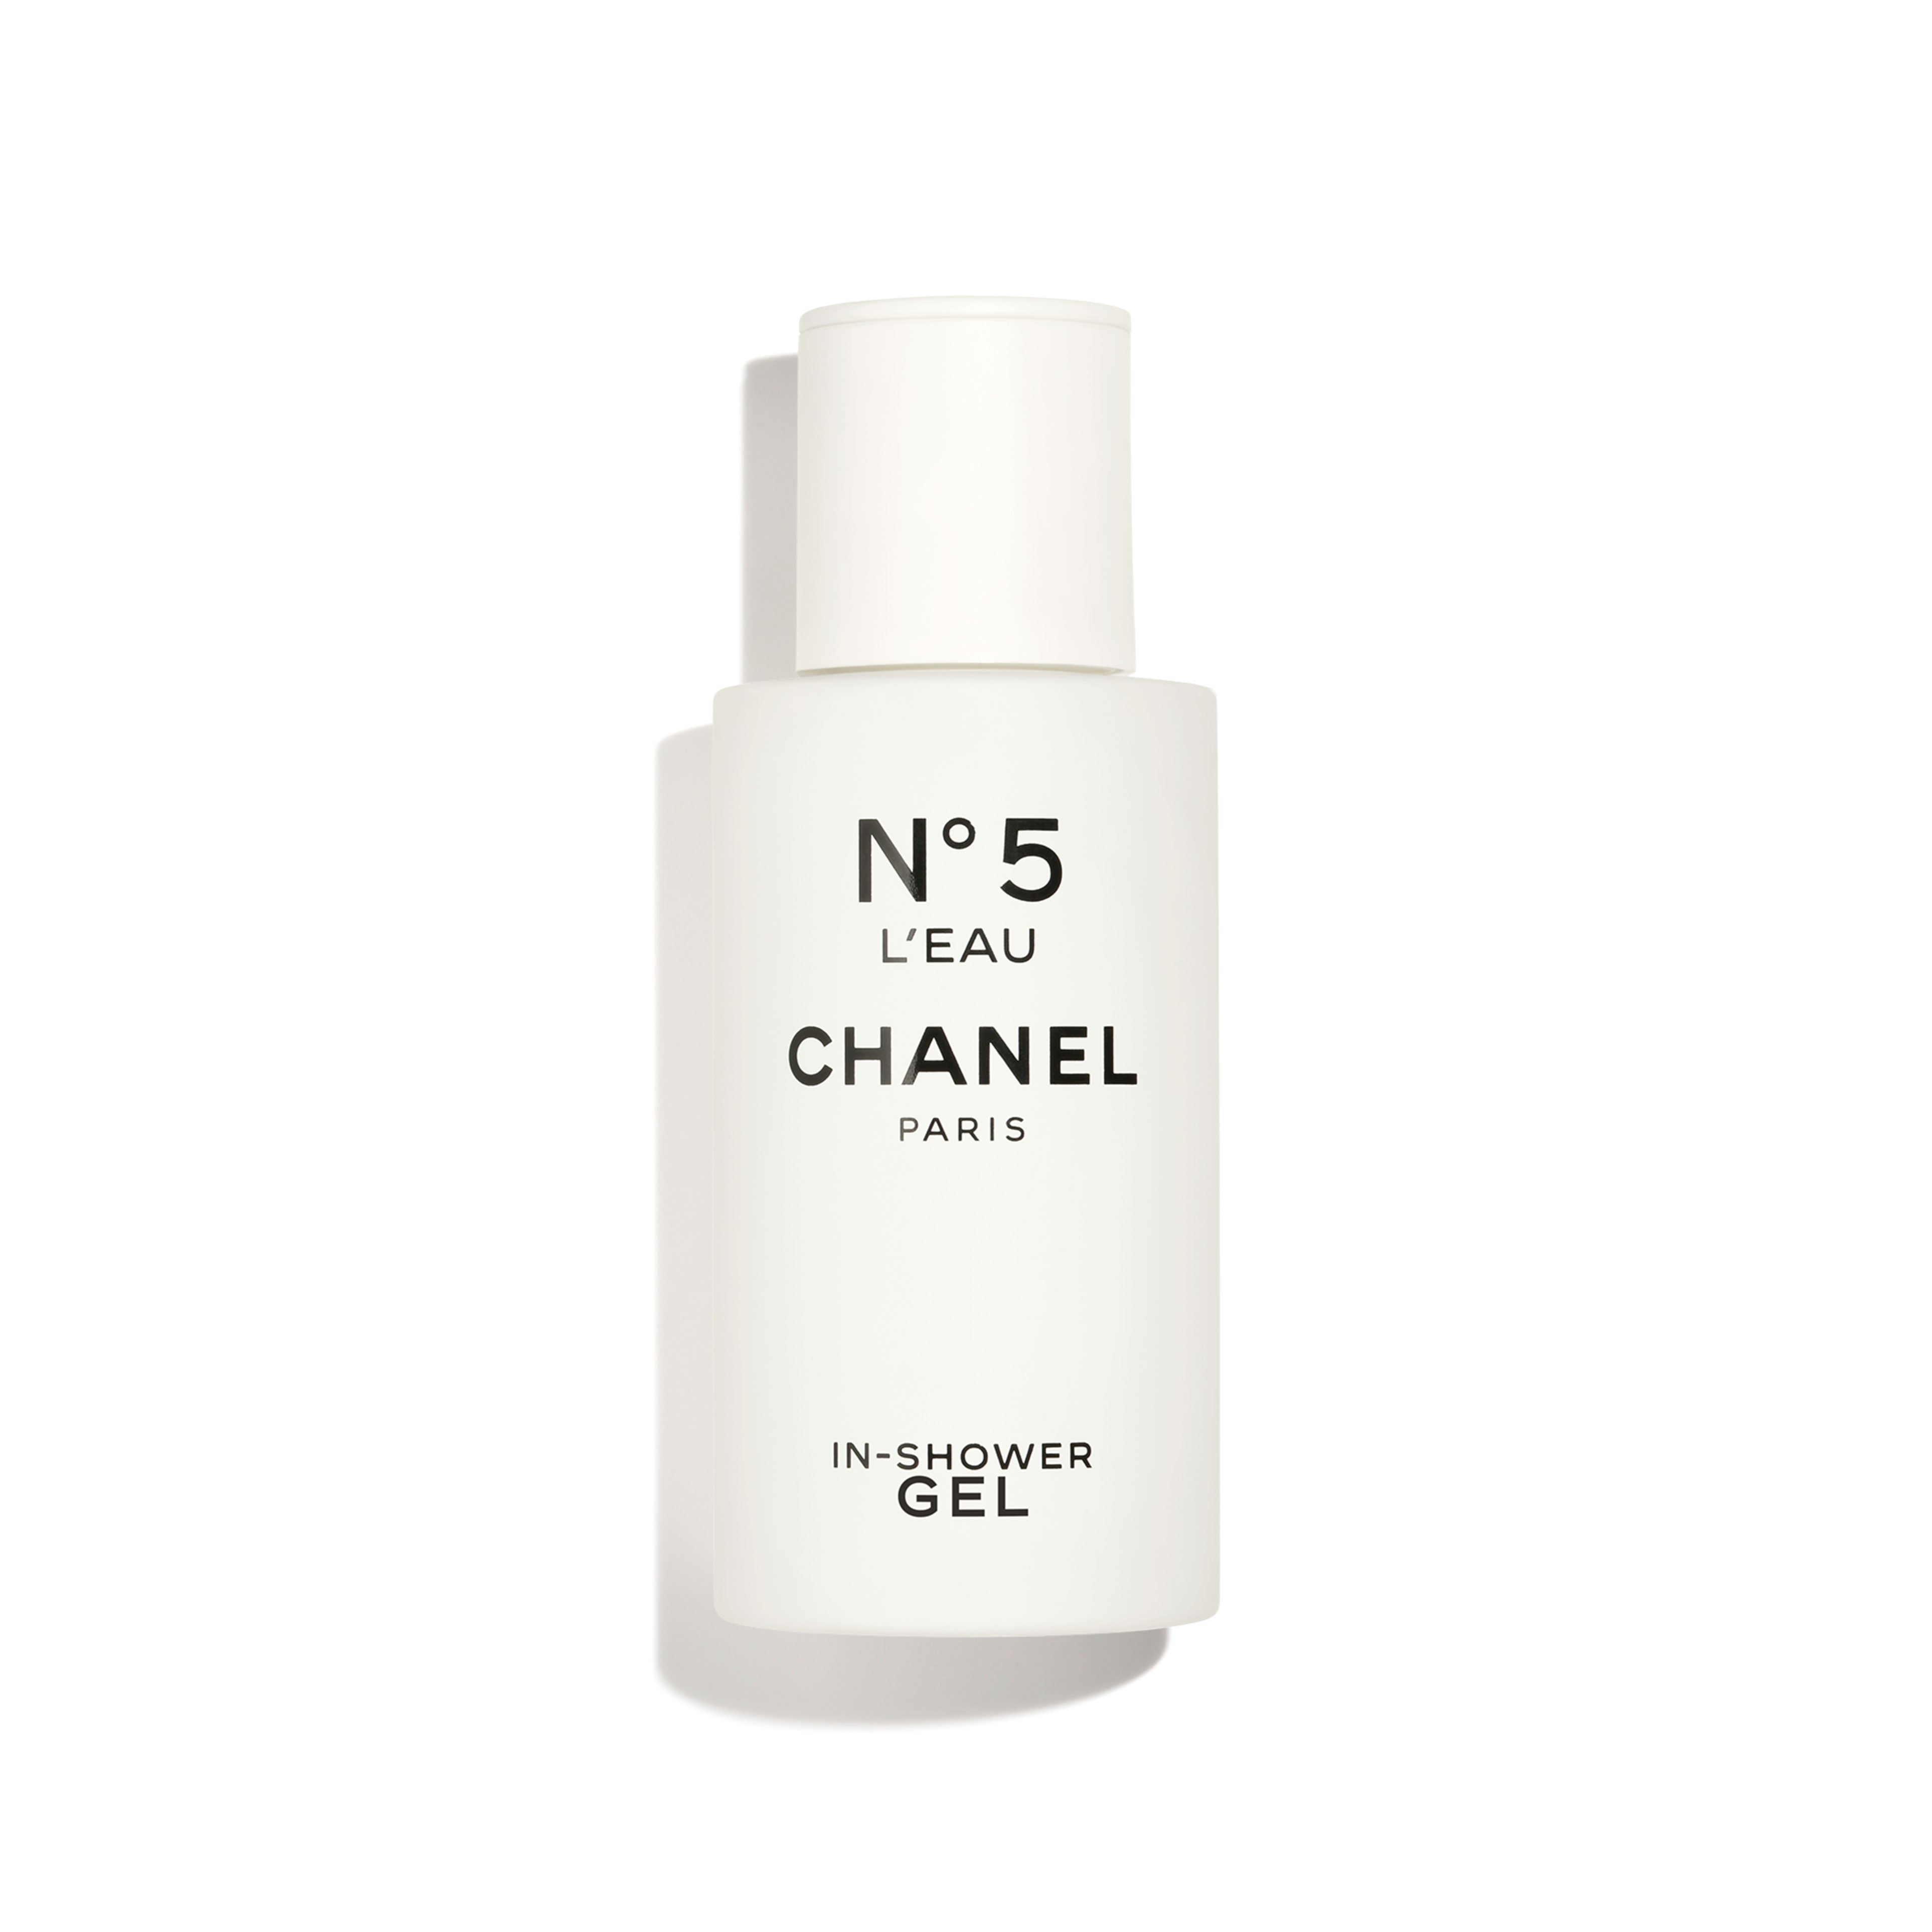 N°5 L'EAU - fragrance - 100ml - Widok domyślny